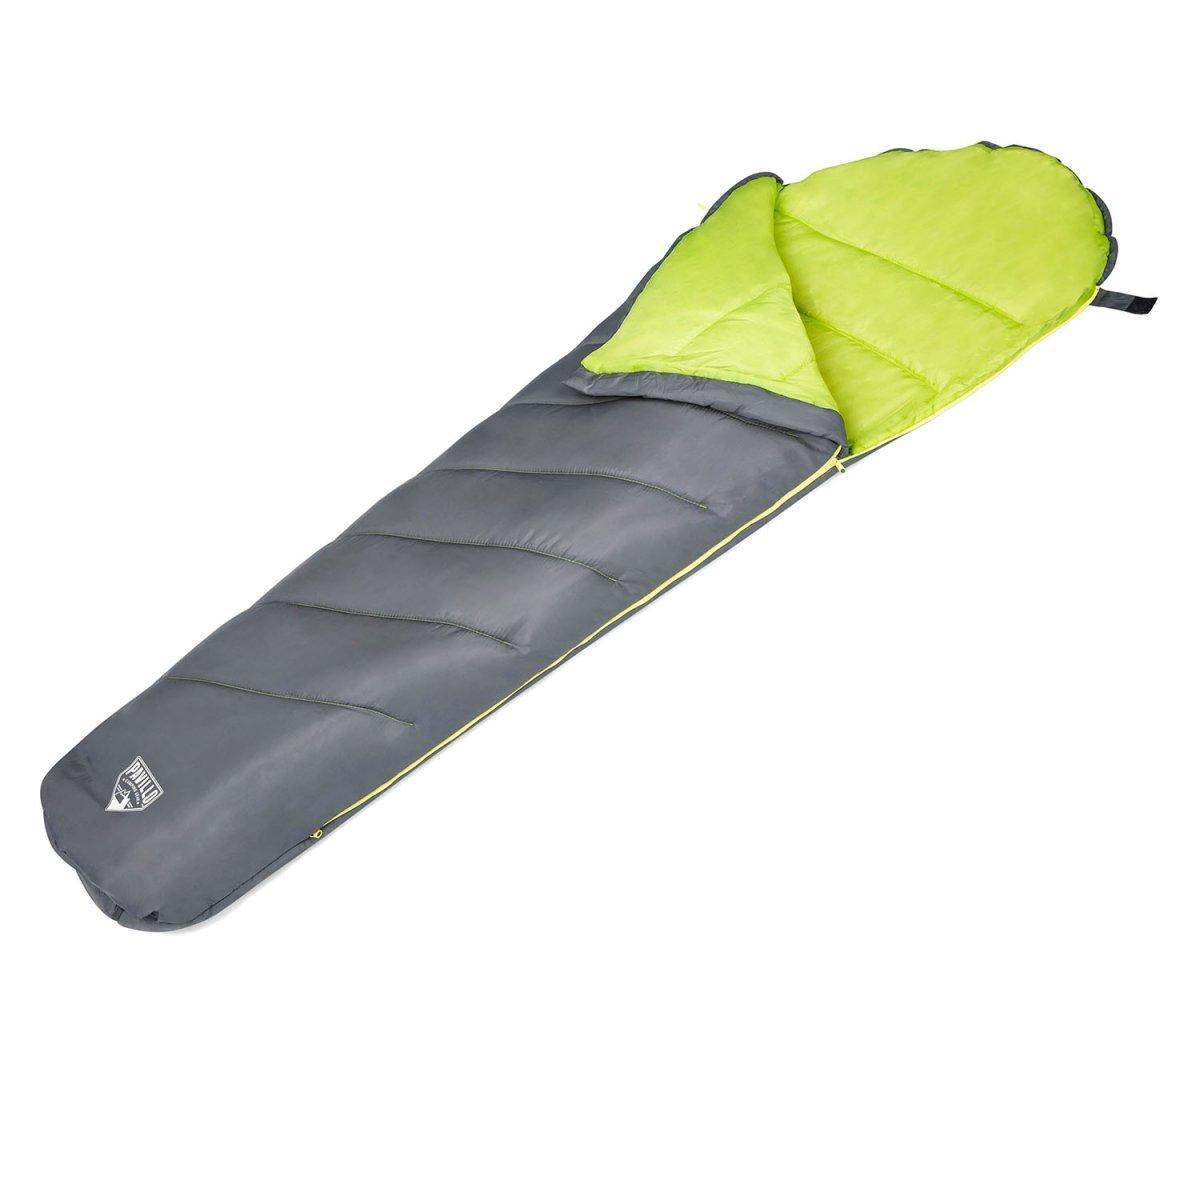 Спальный мешок Bestway 68102 Hiberhide 10, серый